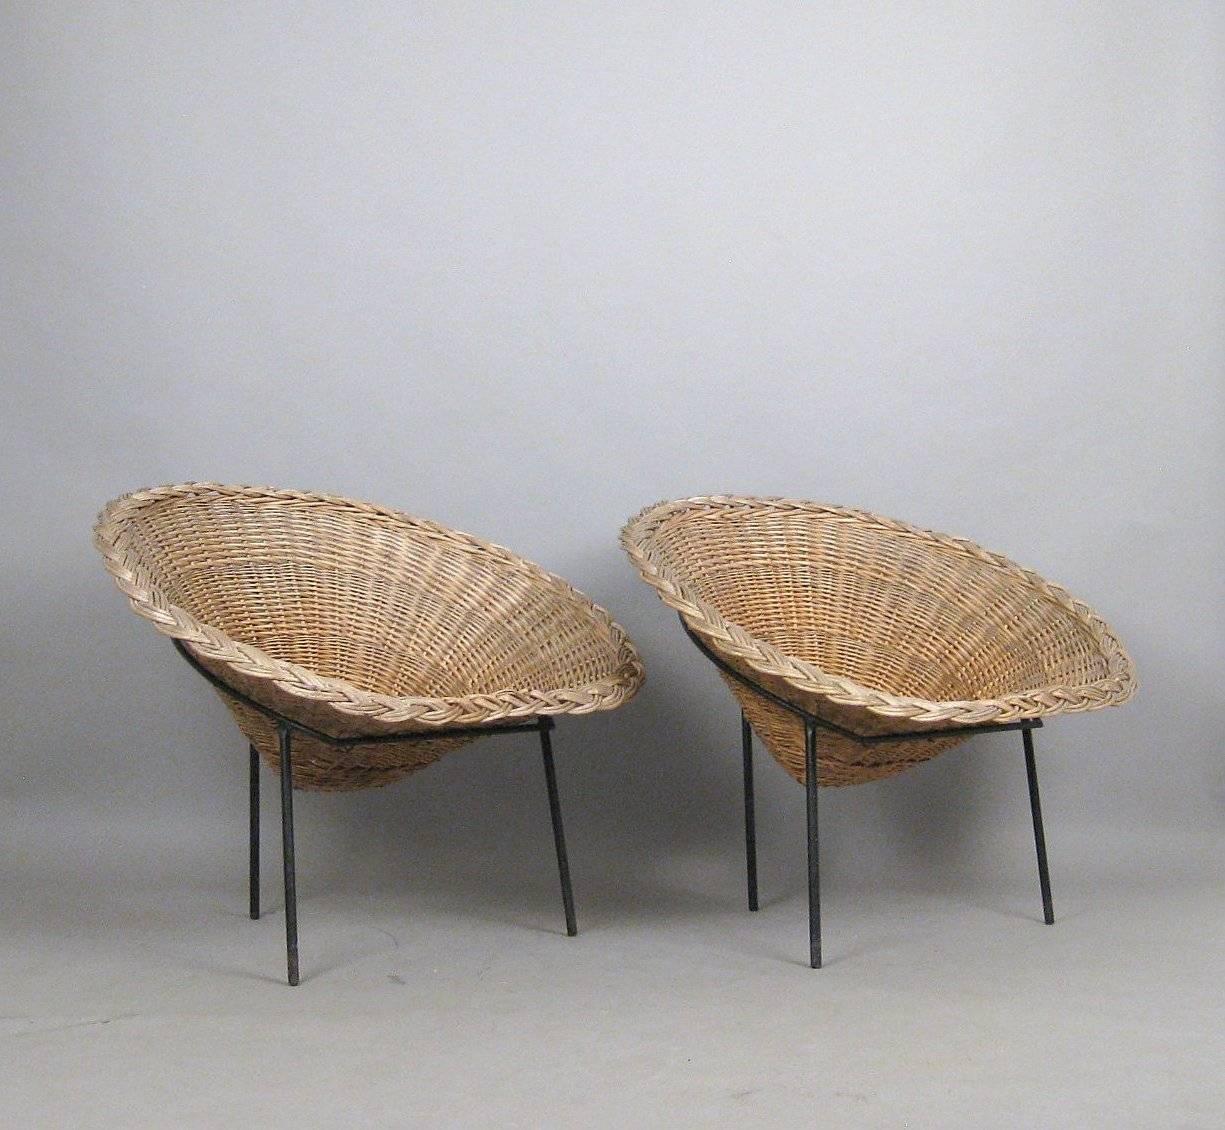 Pair of Mid Century Italian Wicker Chairs by Roberto Mango